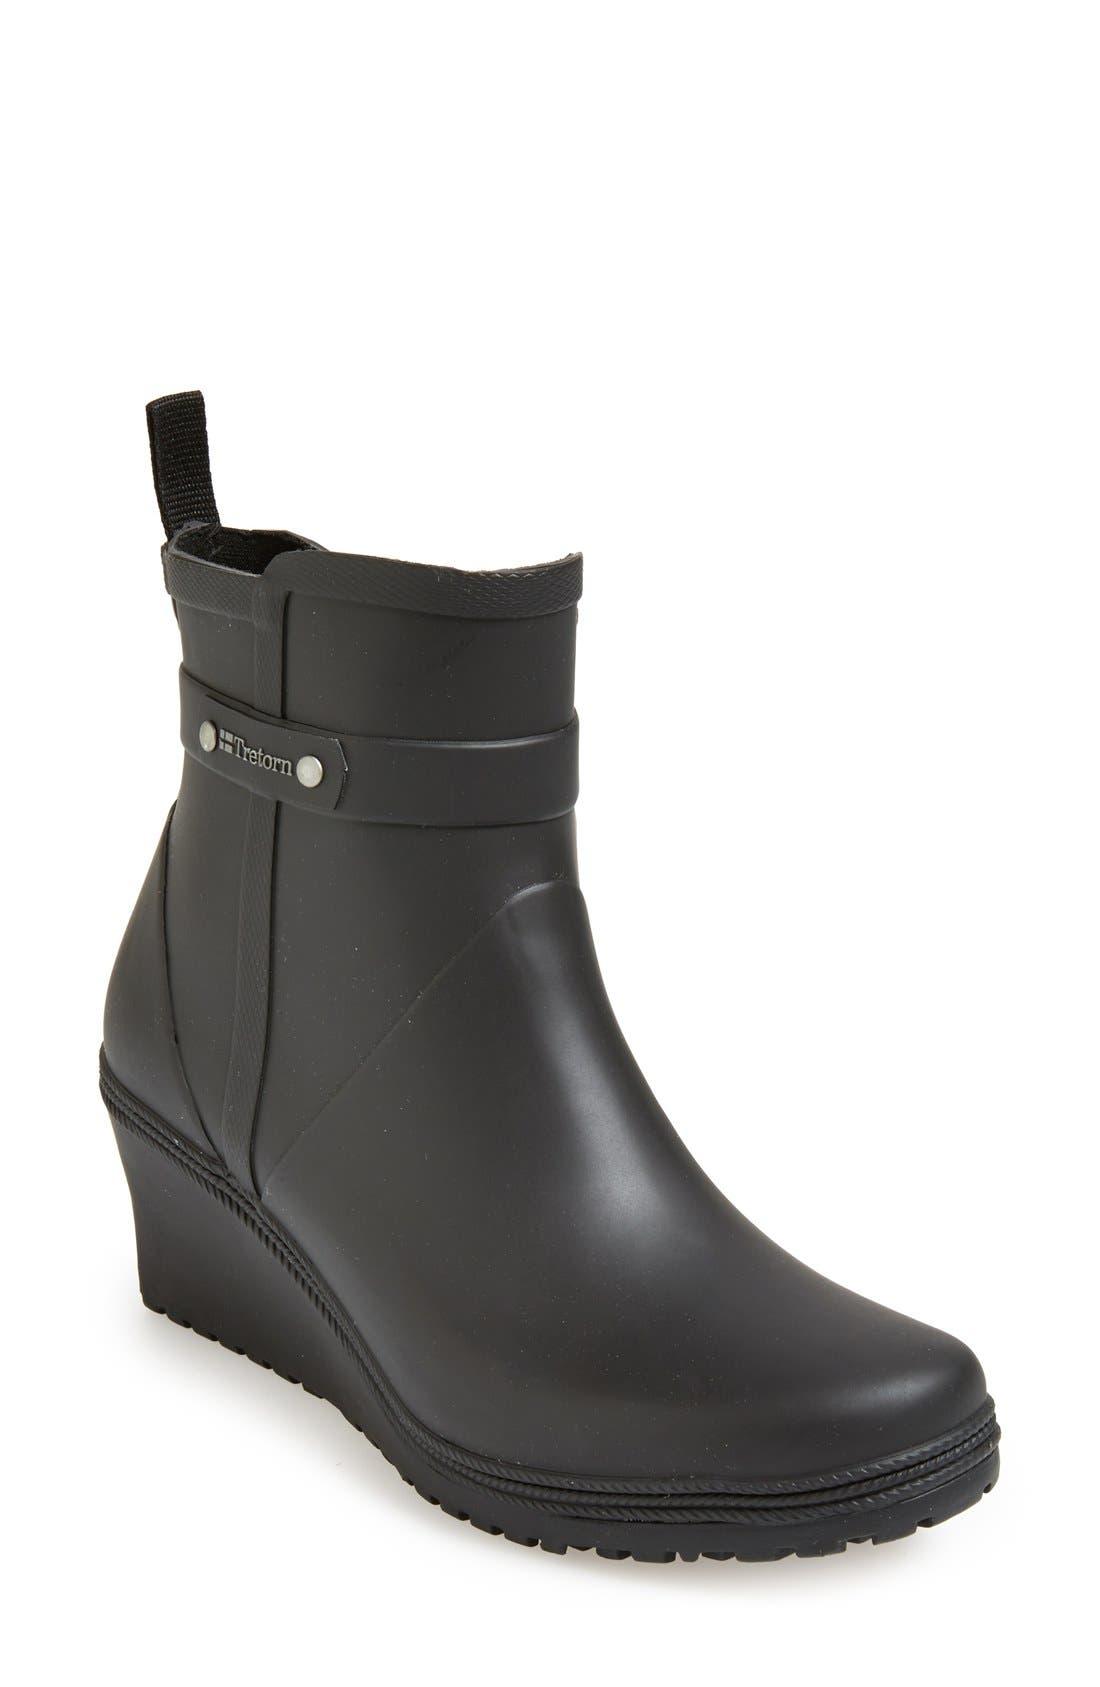 Alternate Image 1 Selected - Tretorn 'Plask' Rain Boot (Women)